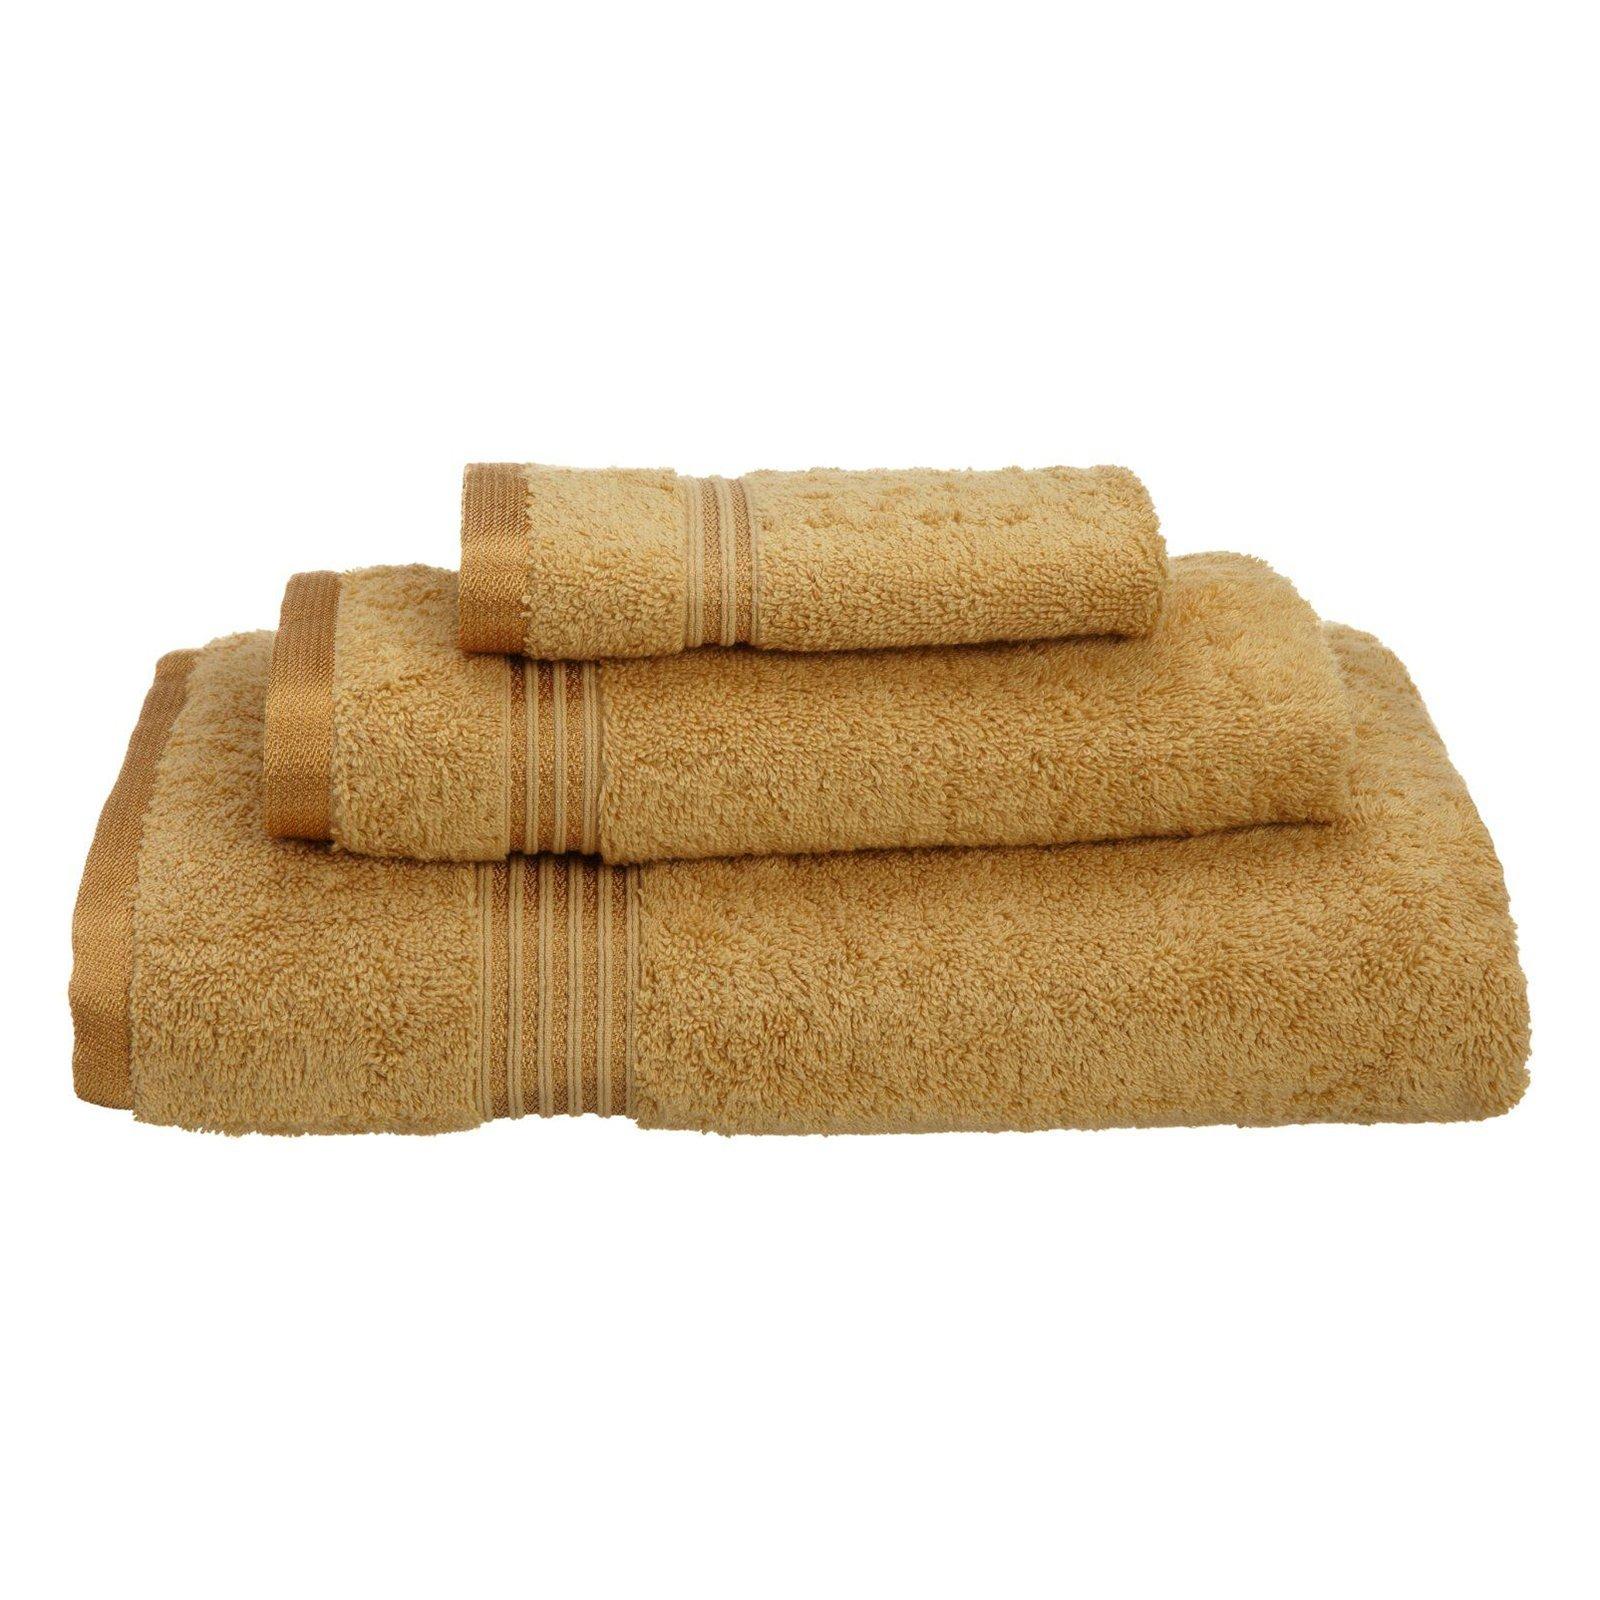 Superior 600GSM Egyptian Quality Cotton 3-Piece Towel Set